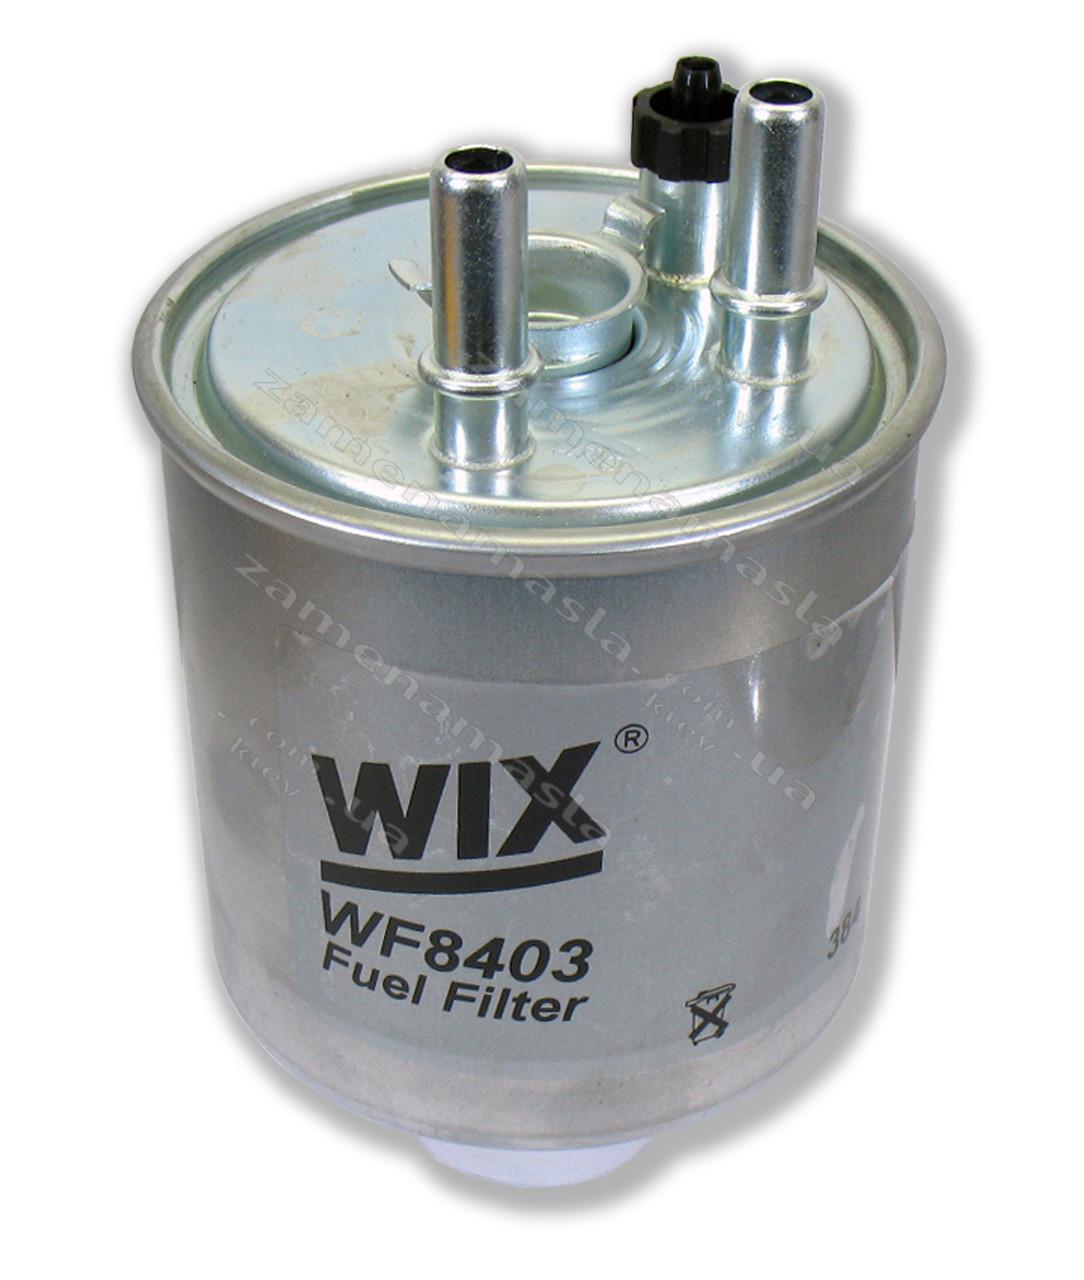 WIX WF8403 аналог ST-6164 на Renault